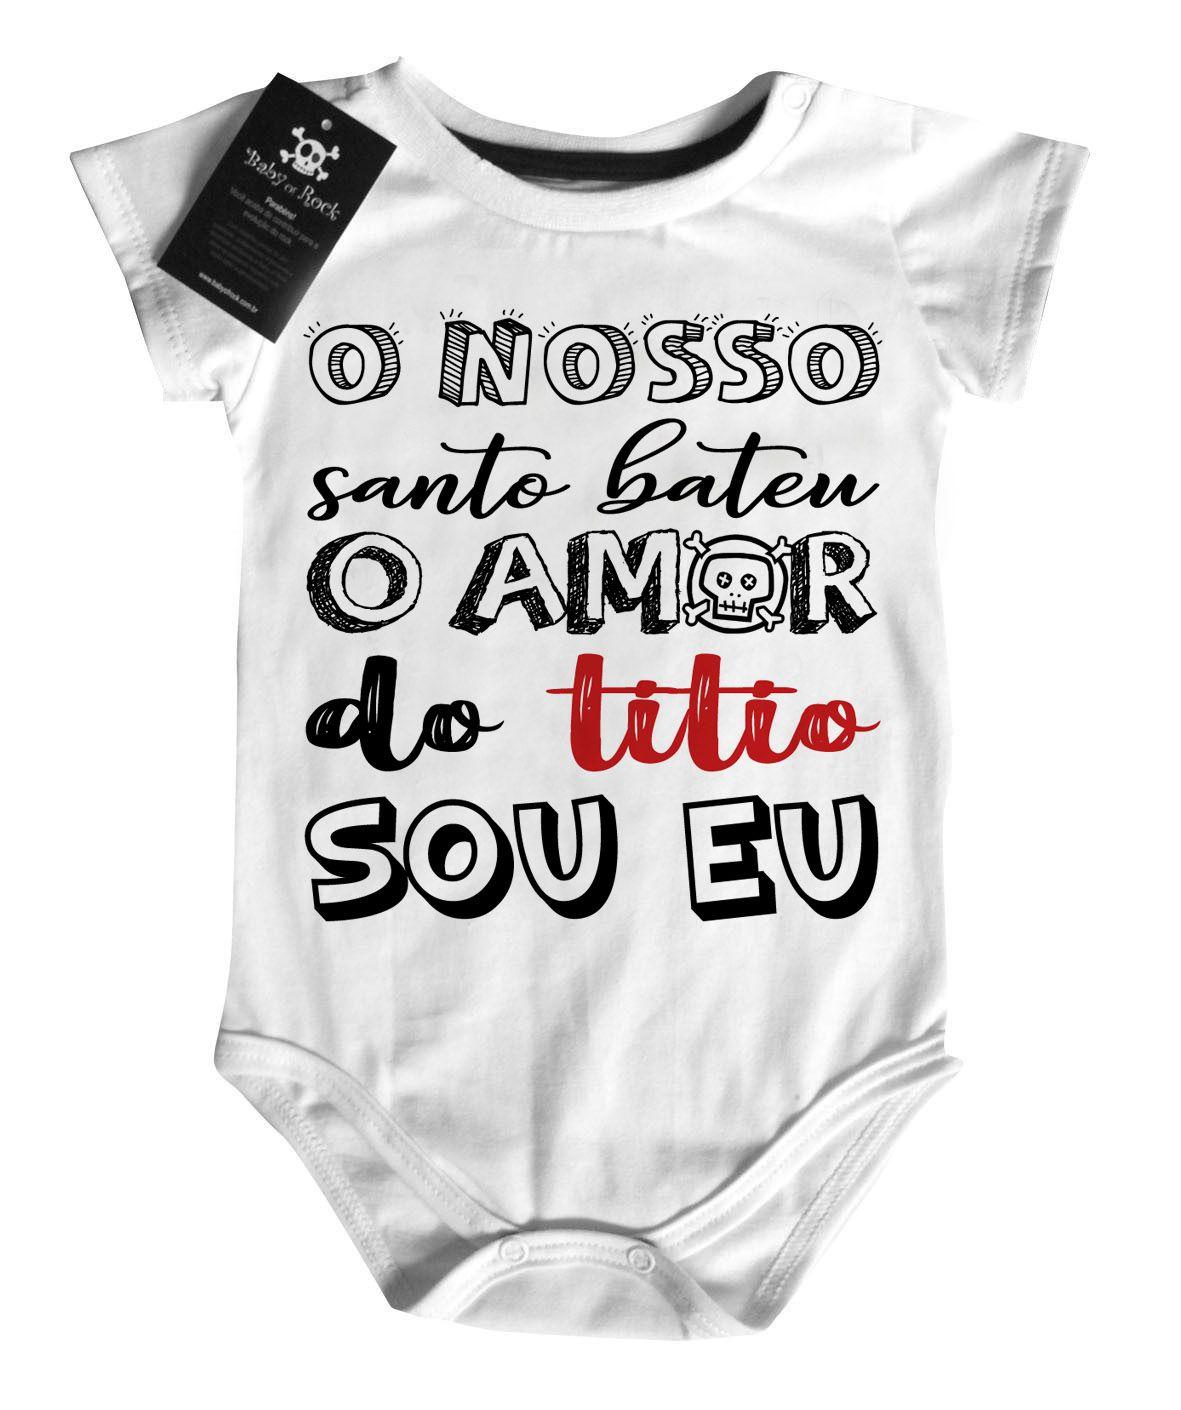 Body Baby Rock - Amor do Titio- White  - Baby Monster - Body Bebe